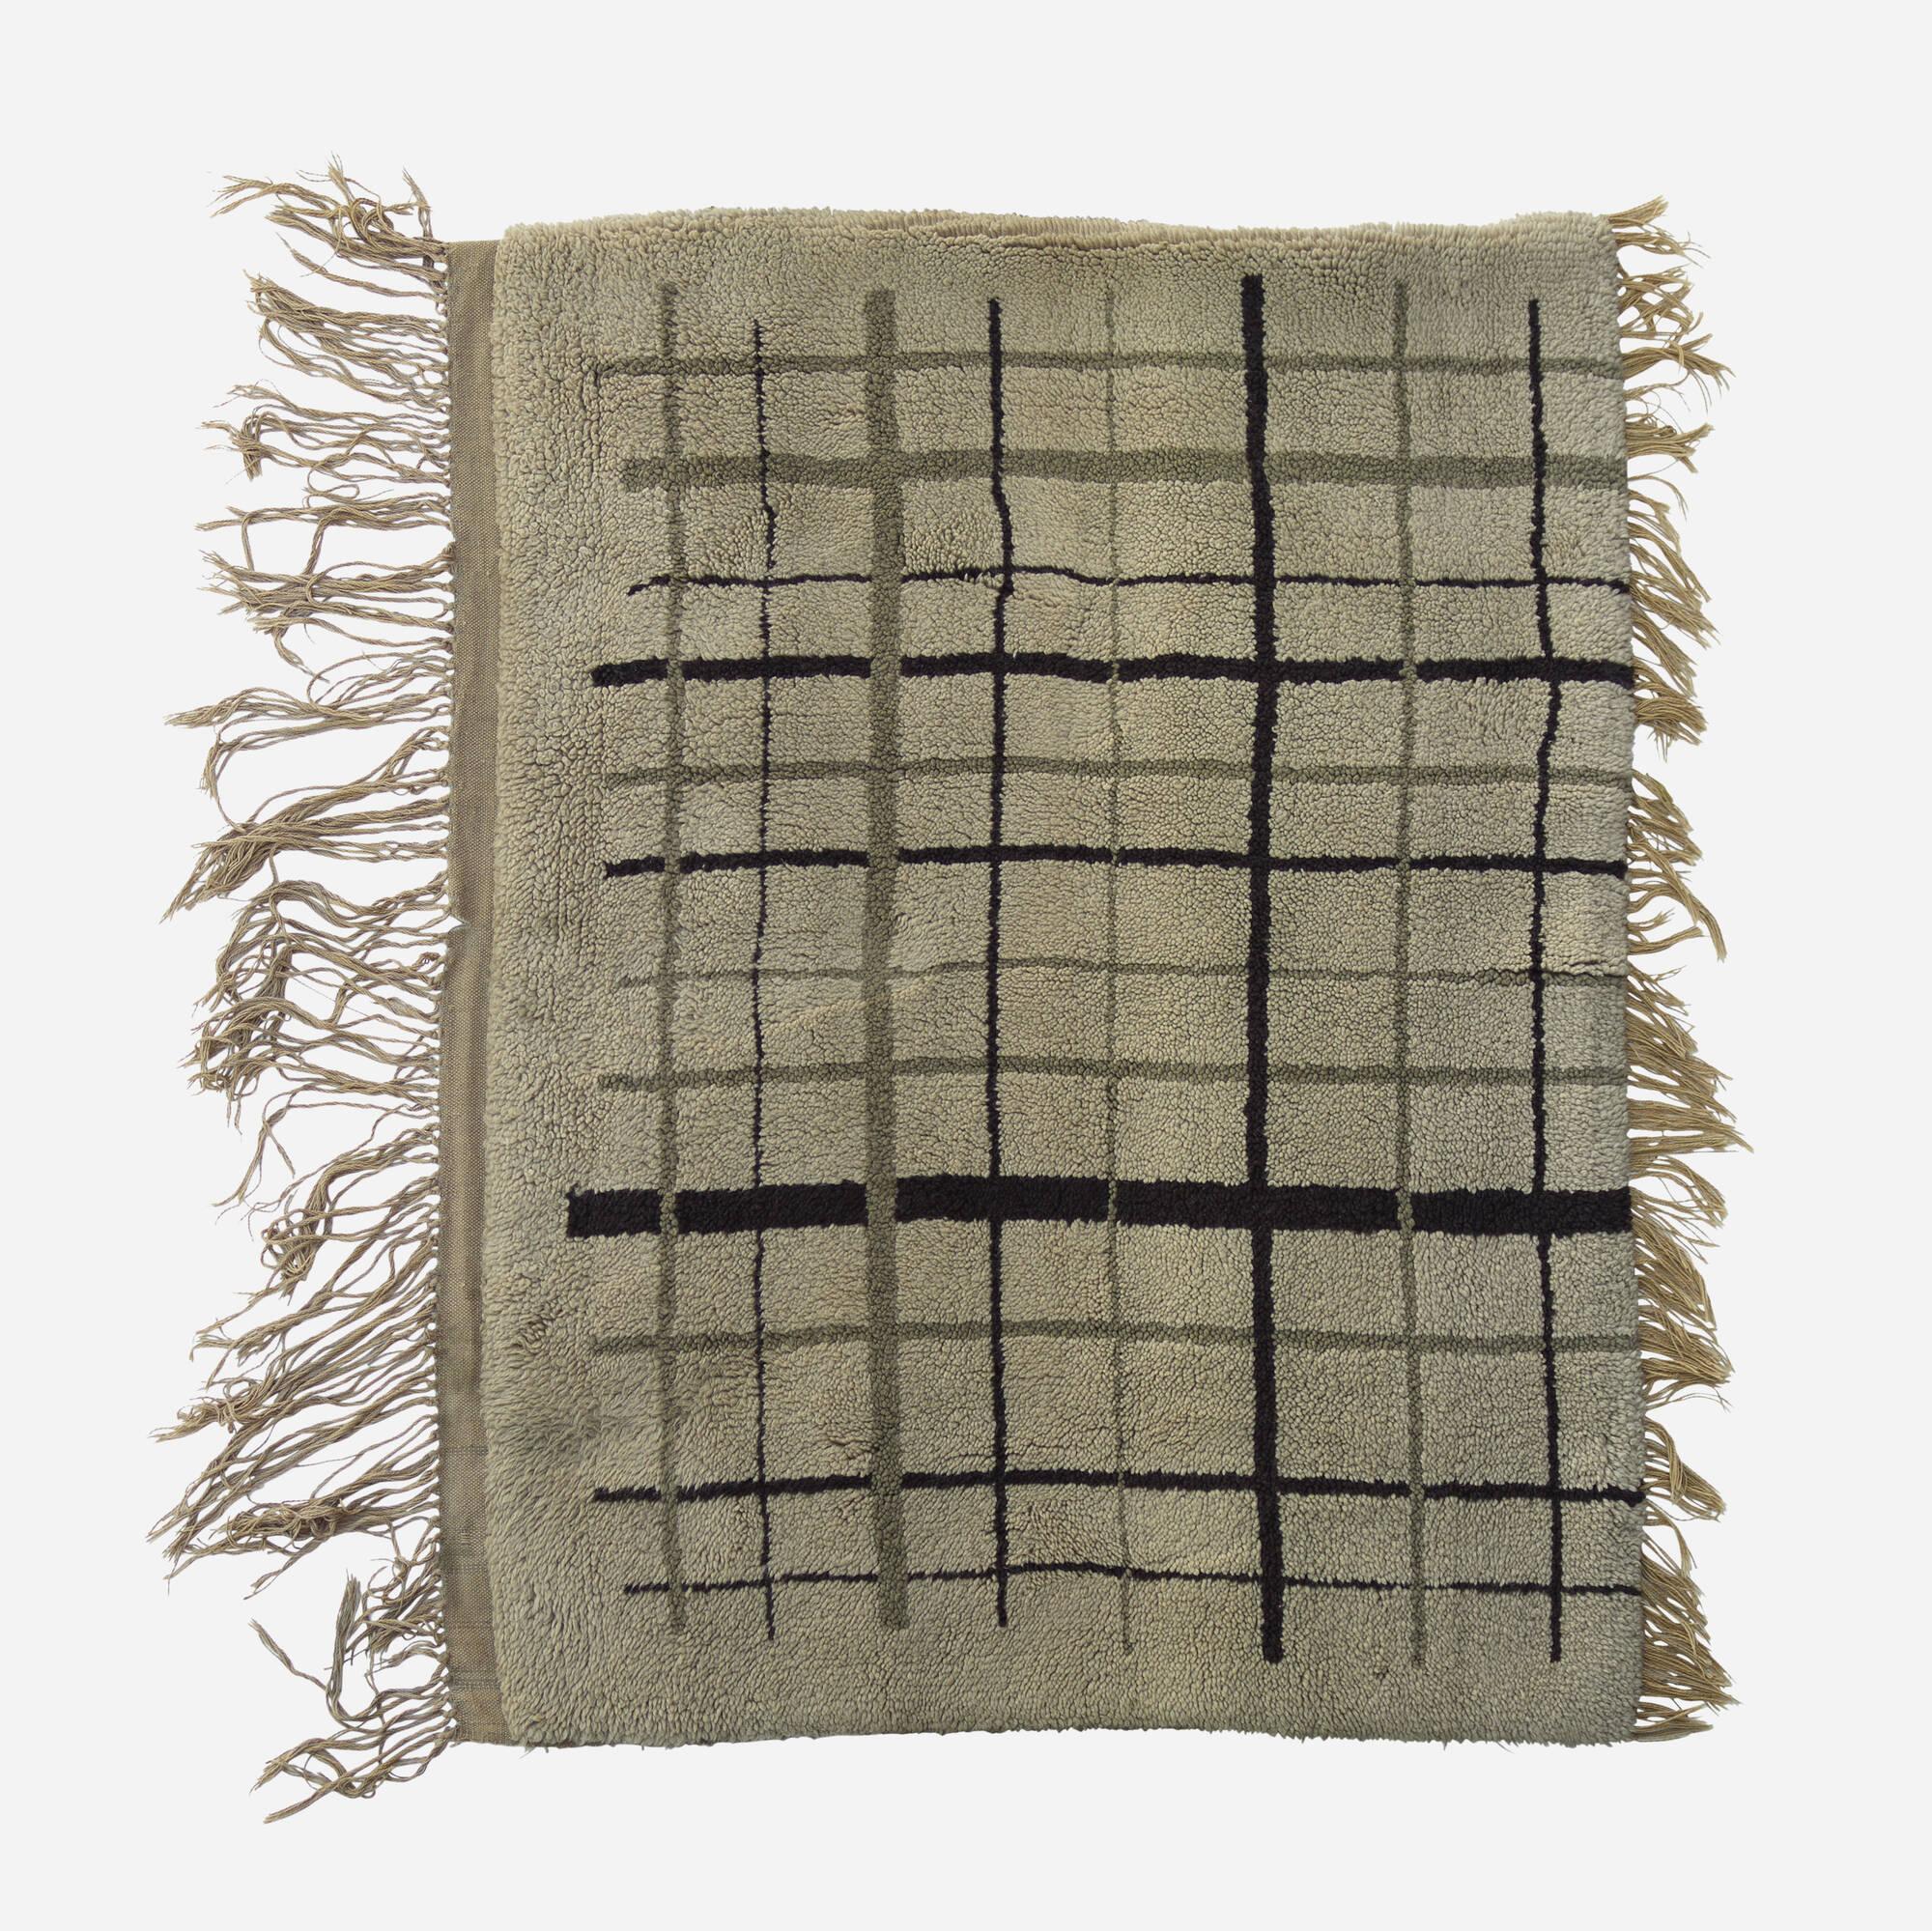 206: Angelo Testa / prototype pile carpet (1 of 1)